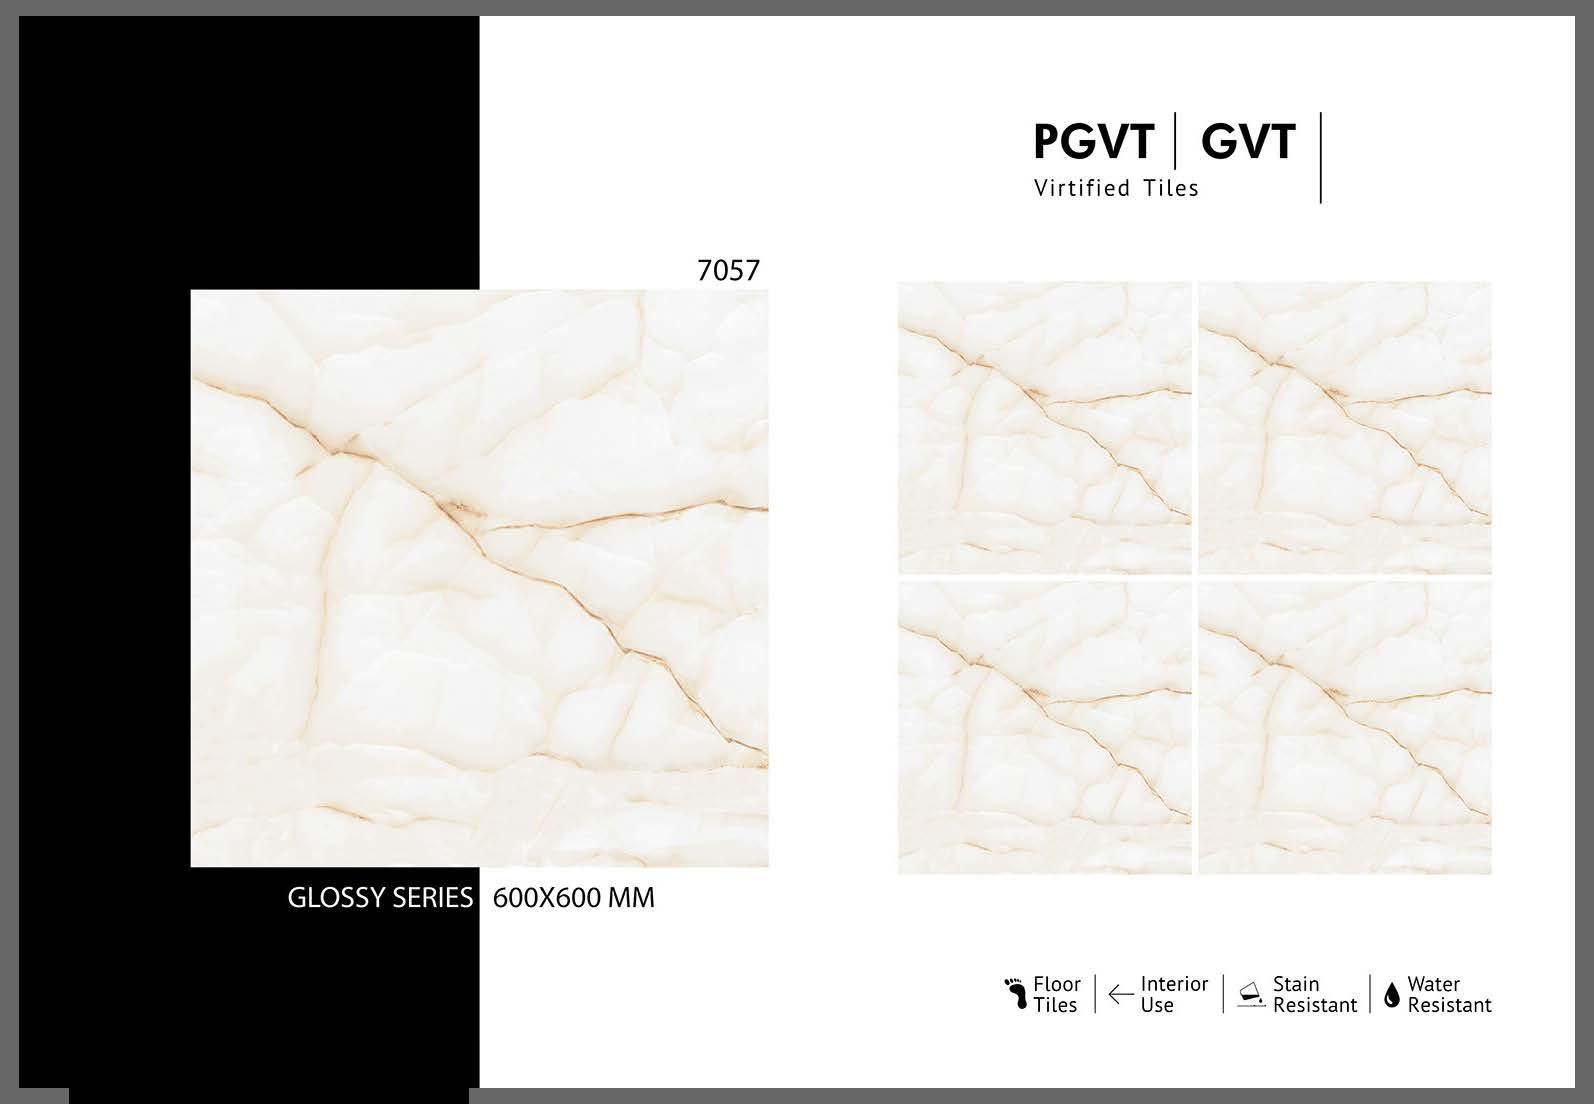 GVT 2X2 GLOSSY_Page_44.jpg